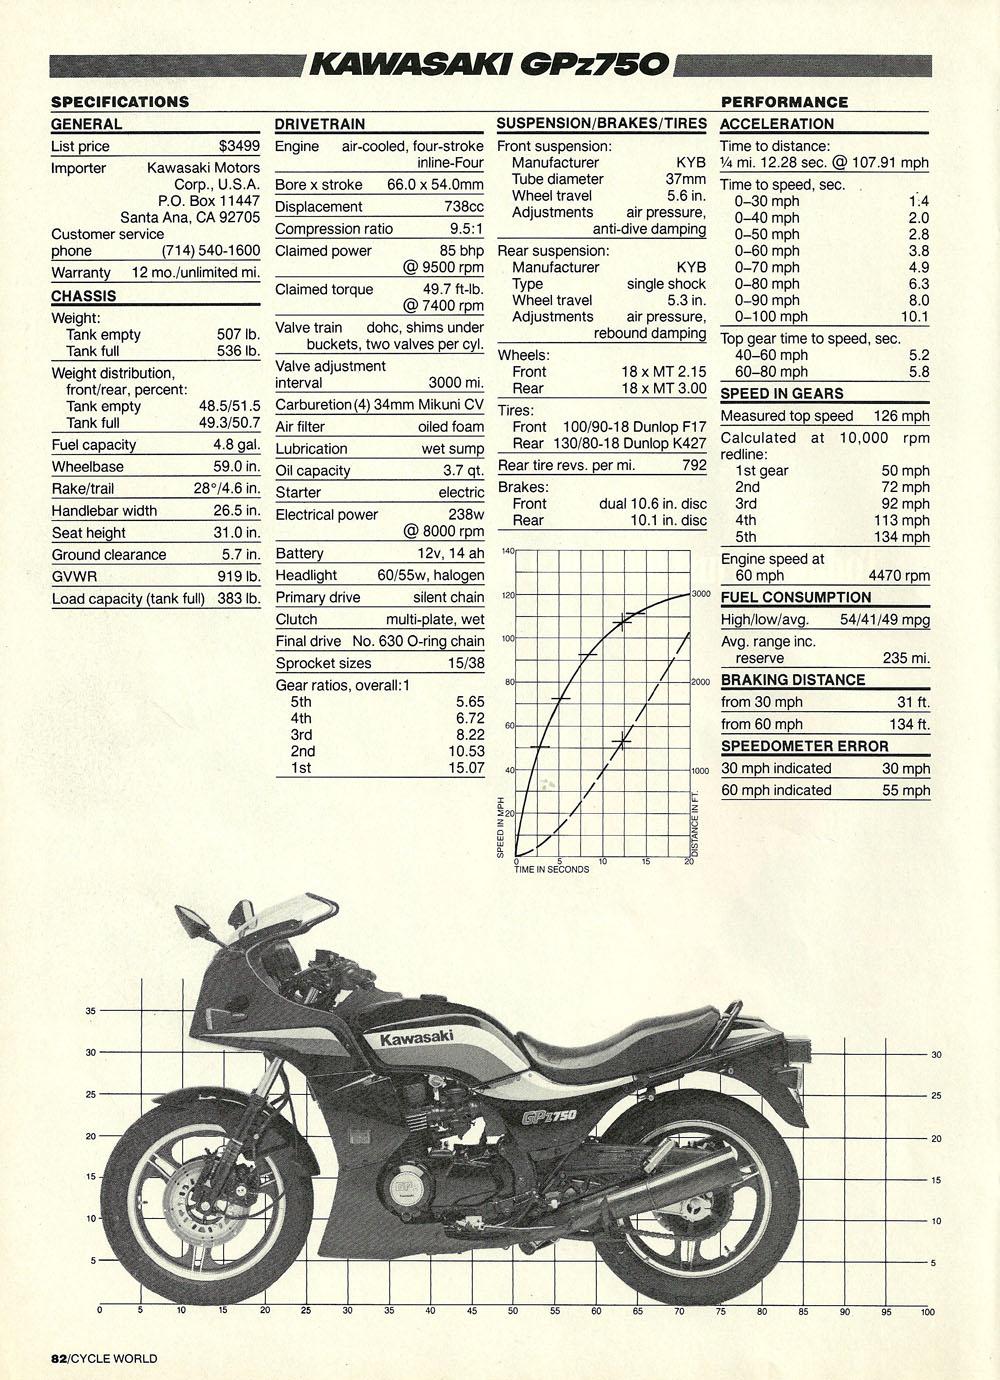 1985 Kawasaki GPz750 road test 04.jpg